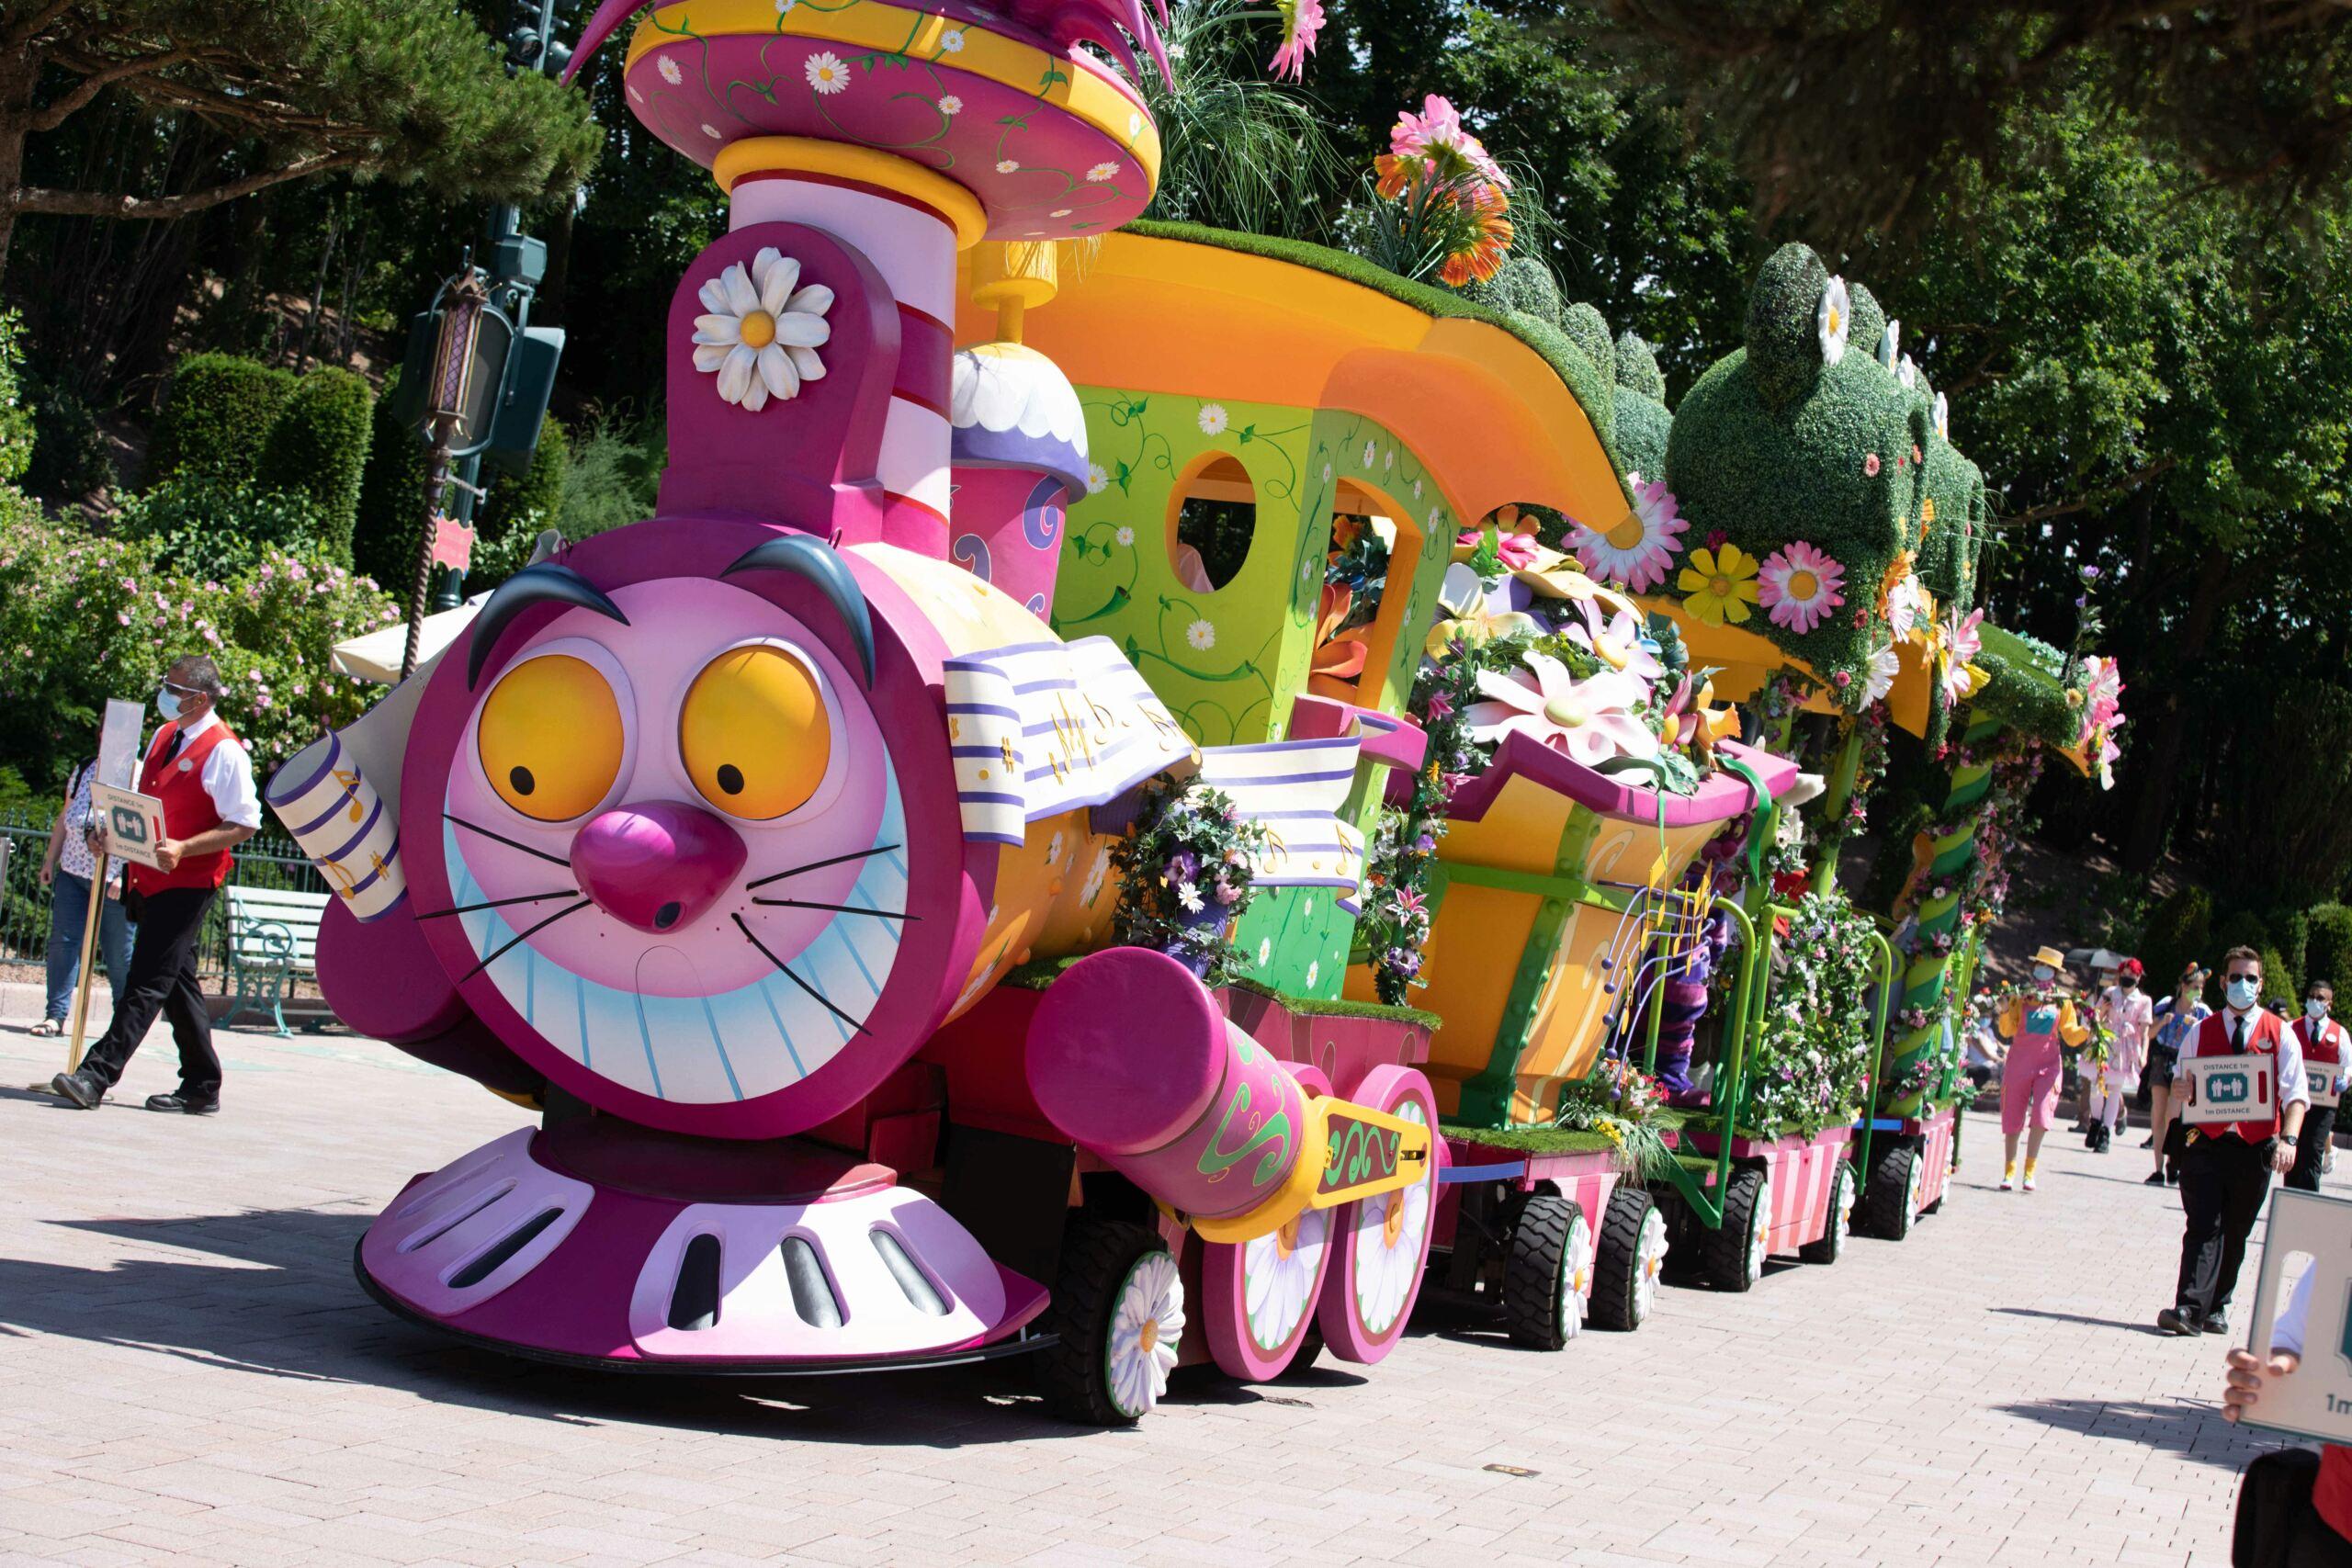 Riapertura di Disneyland Paris - Pagina 12 The_ch11